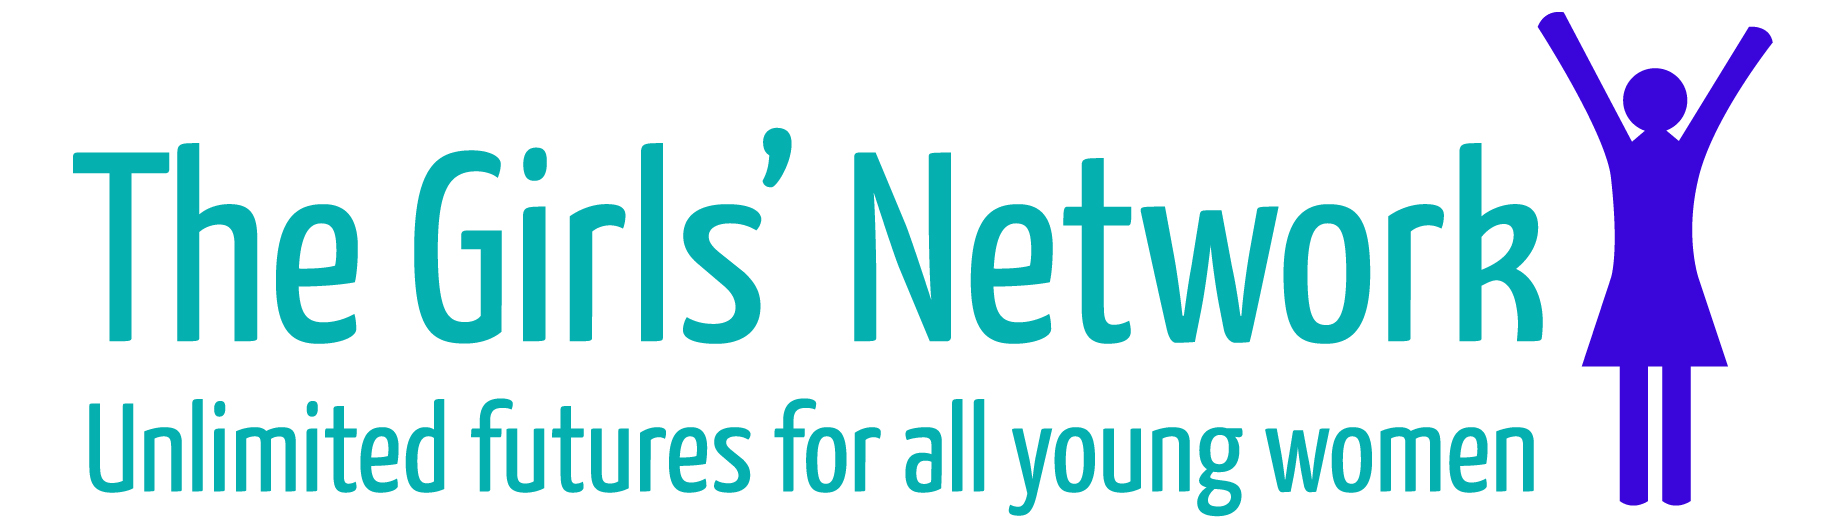 girls network.jpg